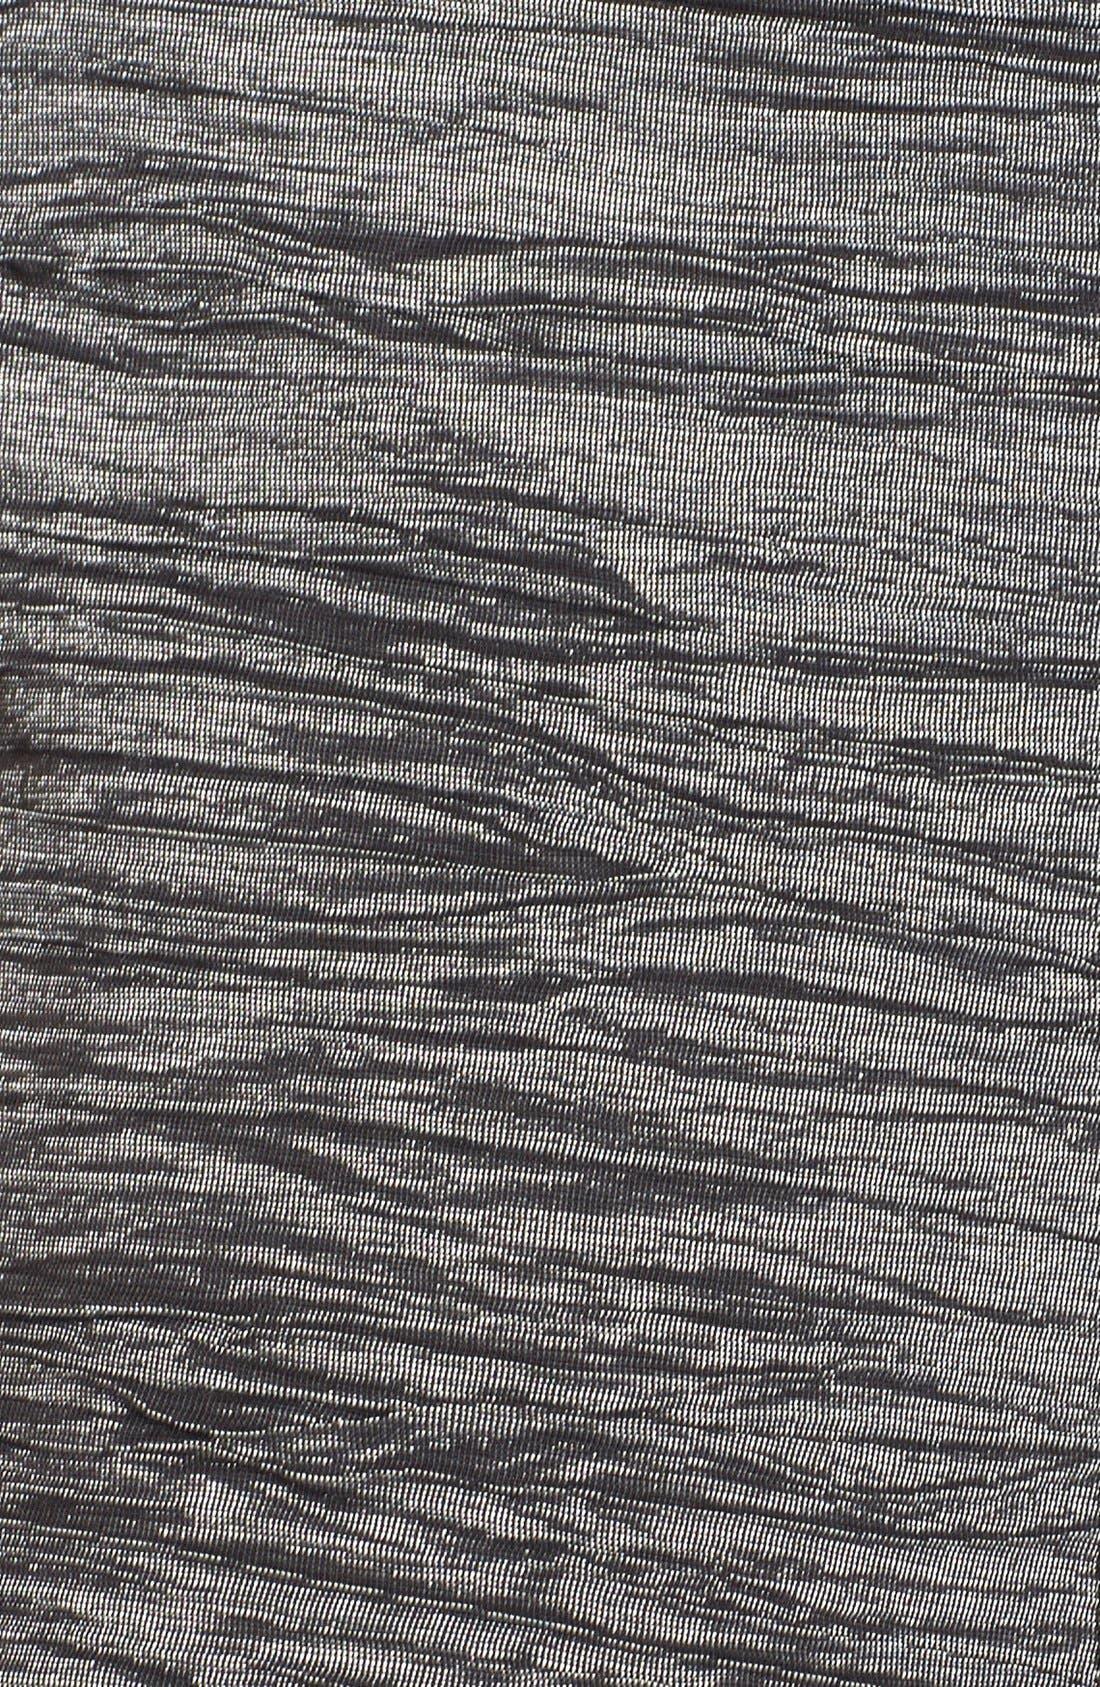 Embellished Crushed Taffeta Sheath Dress,                             Alternate thumbnail 4, color,                             023